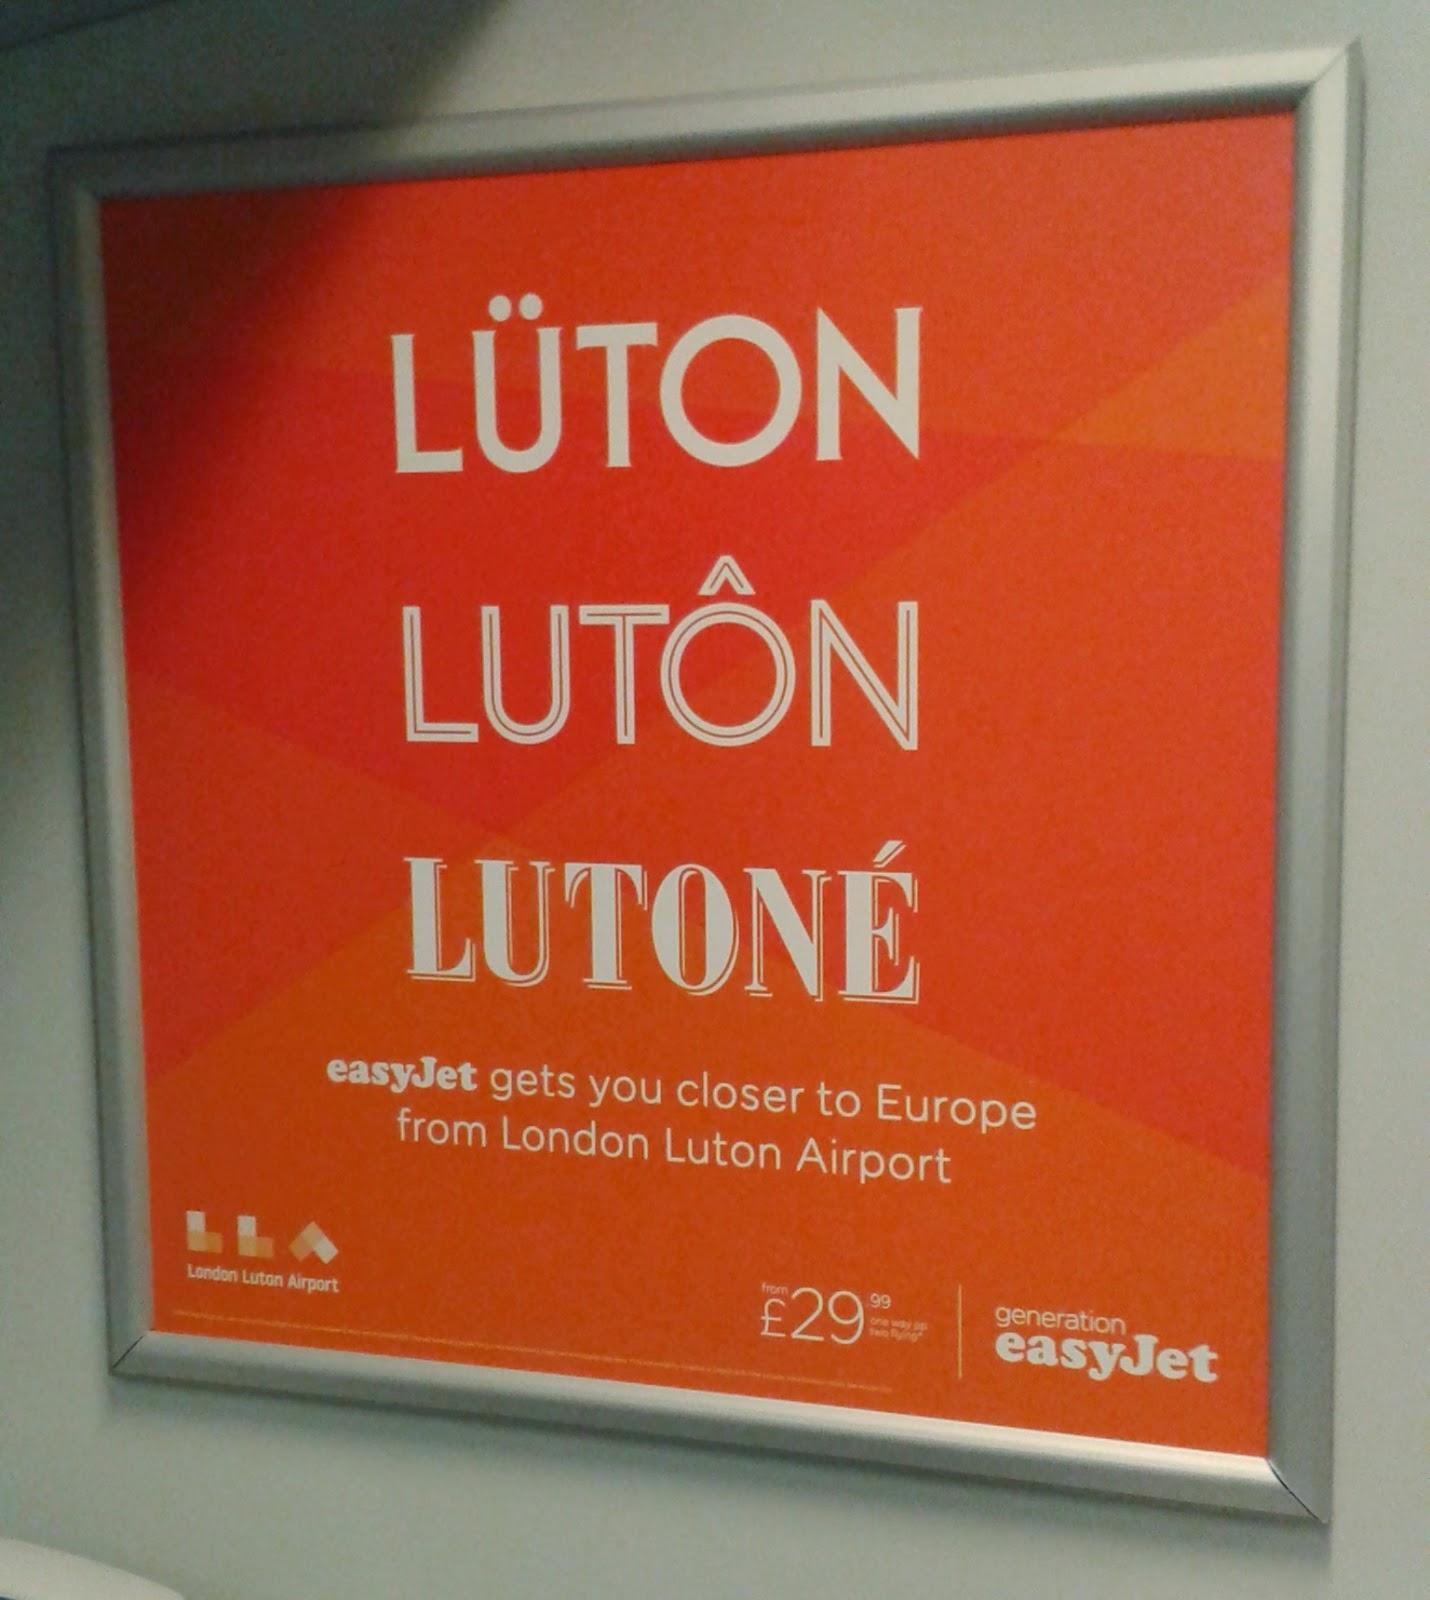 Luton - otherwise known as Lüton, Lutôn and Lutoné